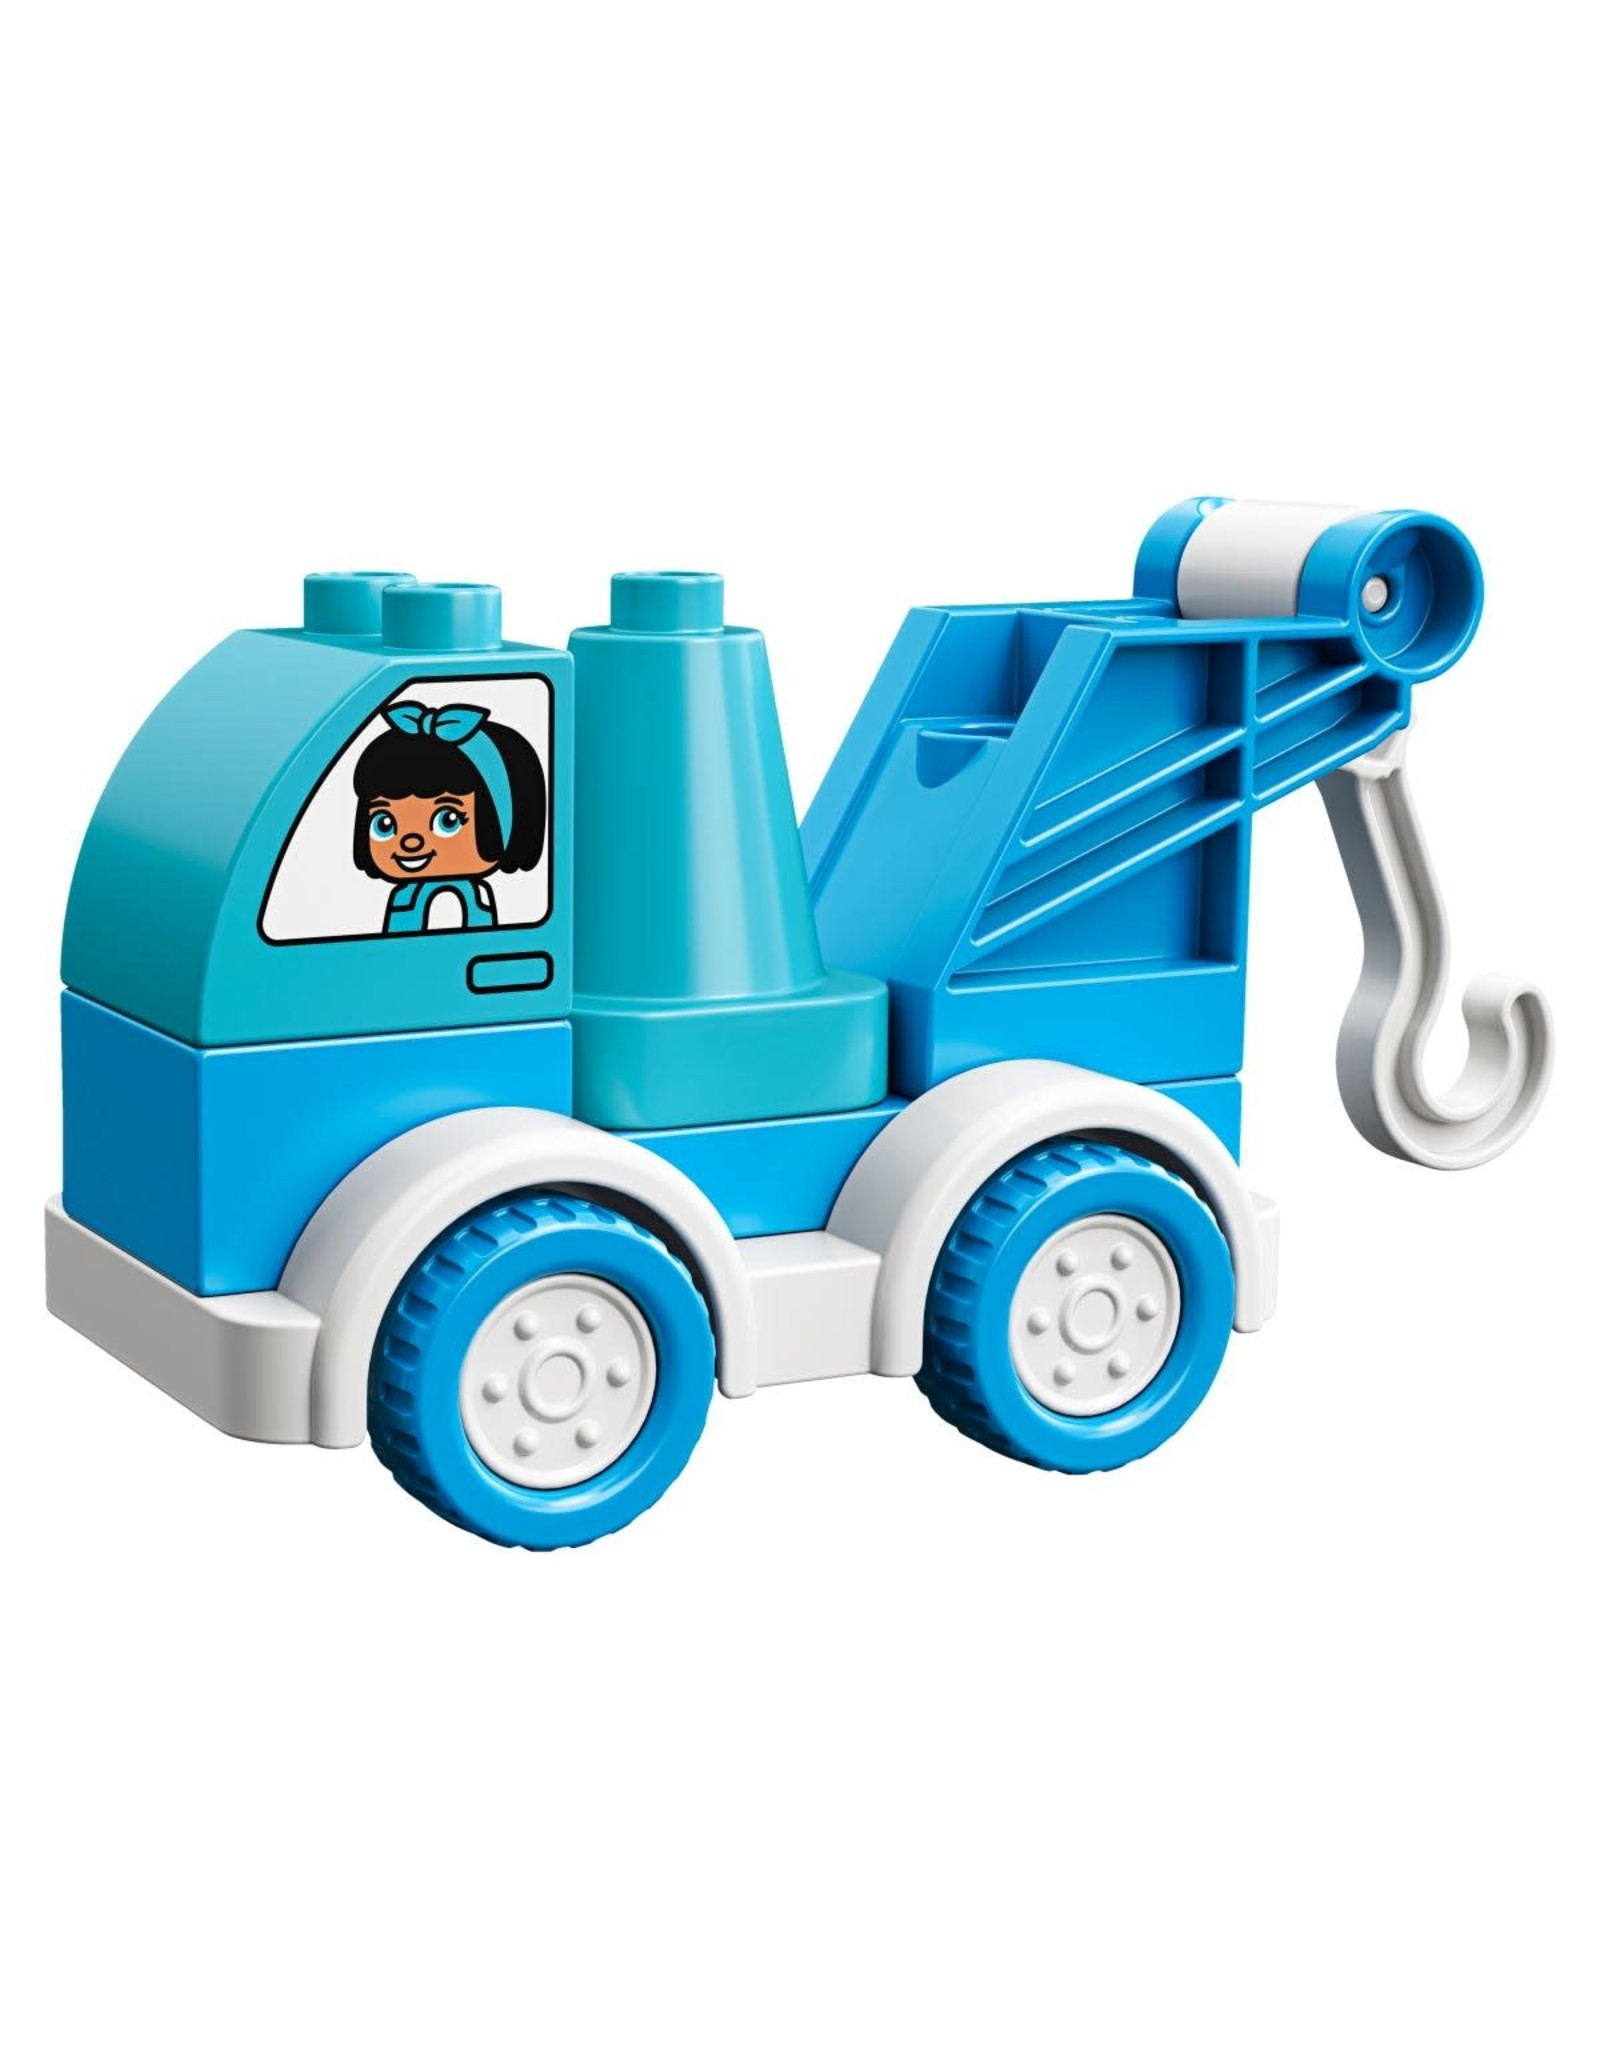 LEGO LEGO DUPLO Tow Truck